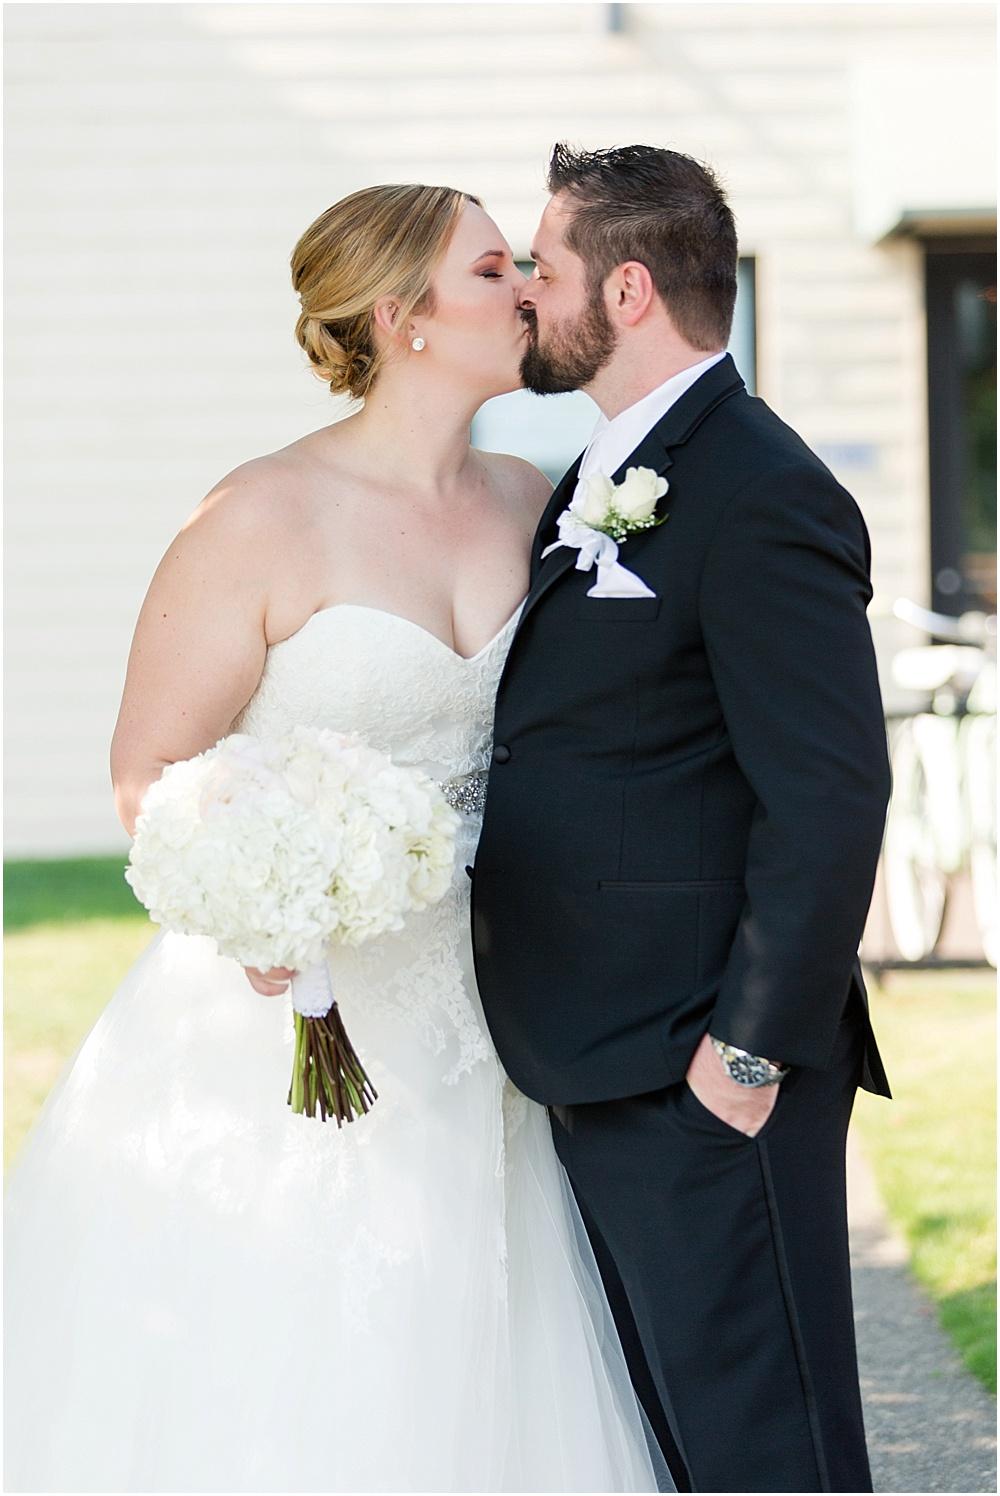 mitzner_silverdale_beach_hotel_wedding_silverdale_washington_pacific_northwest_wedding_photographer_0023